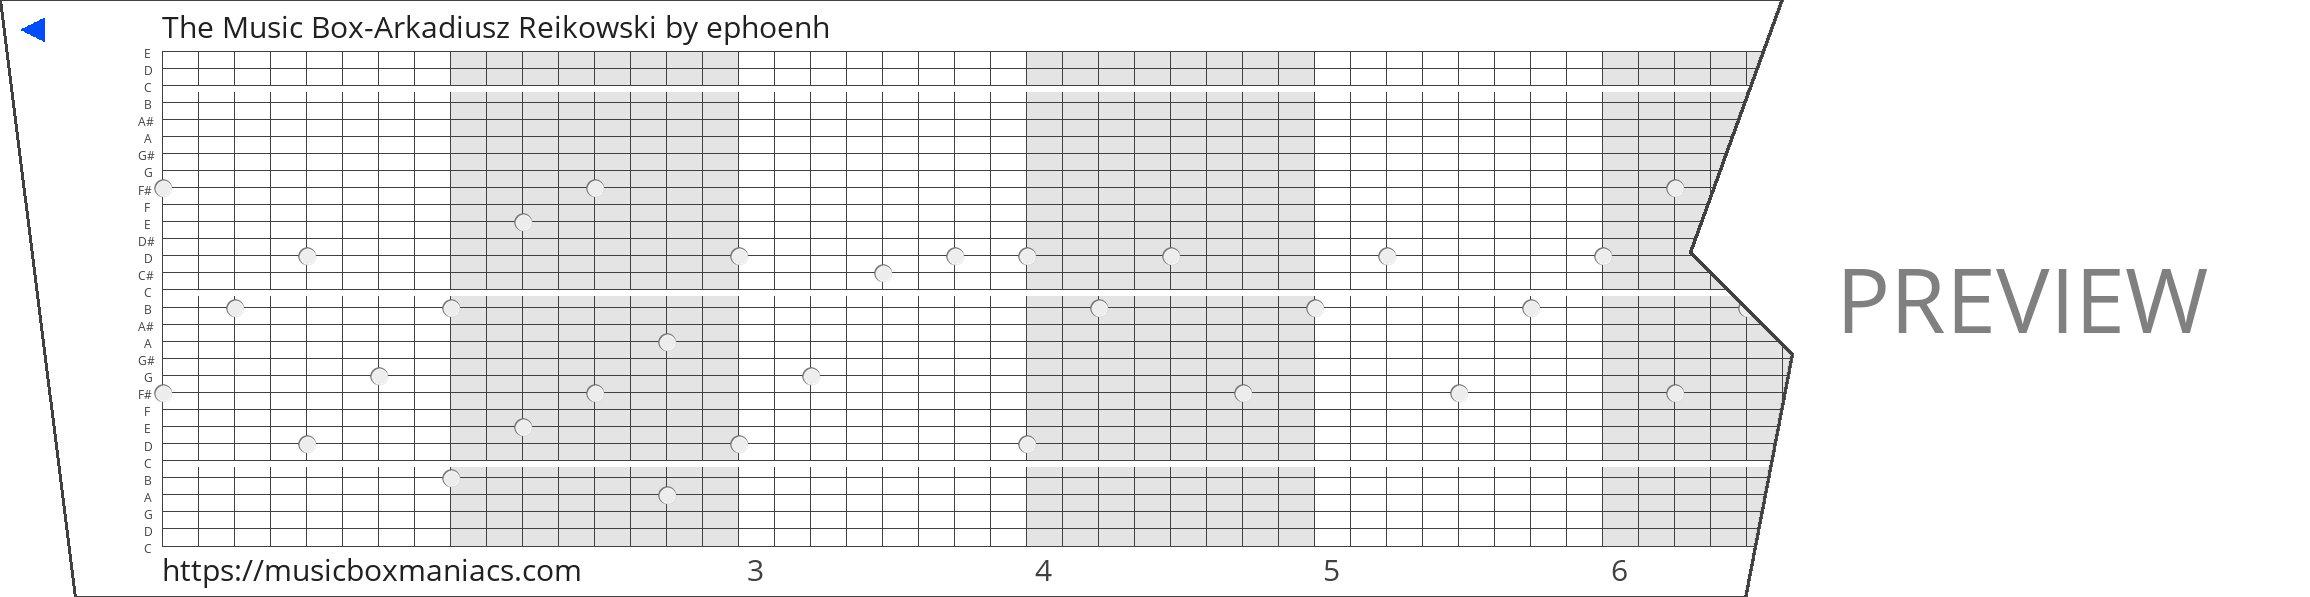 The Music Box-Arkadiusz Reikowski 30 note music box paper strip